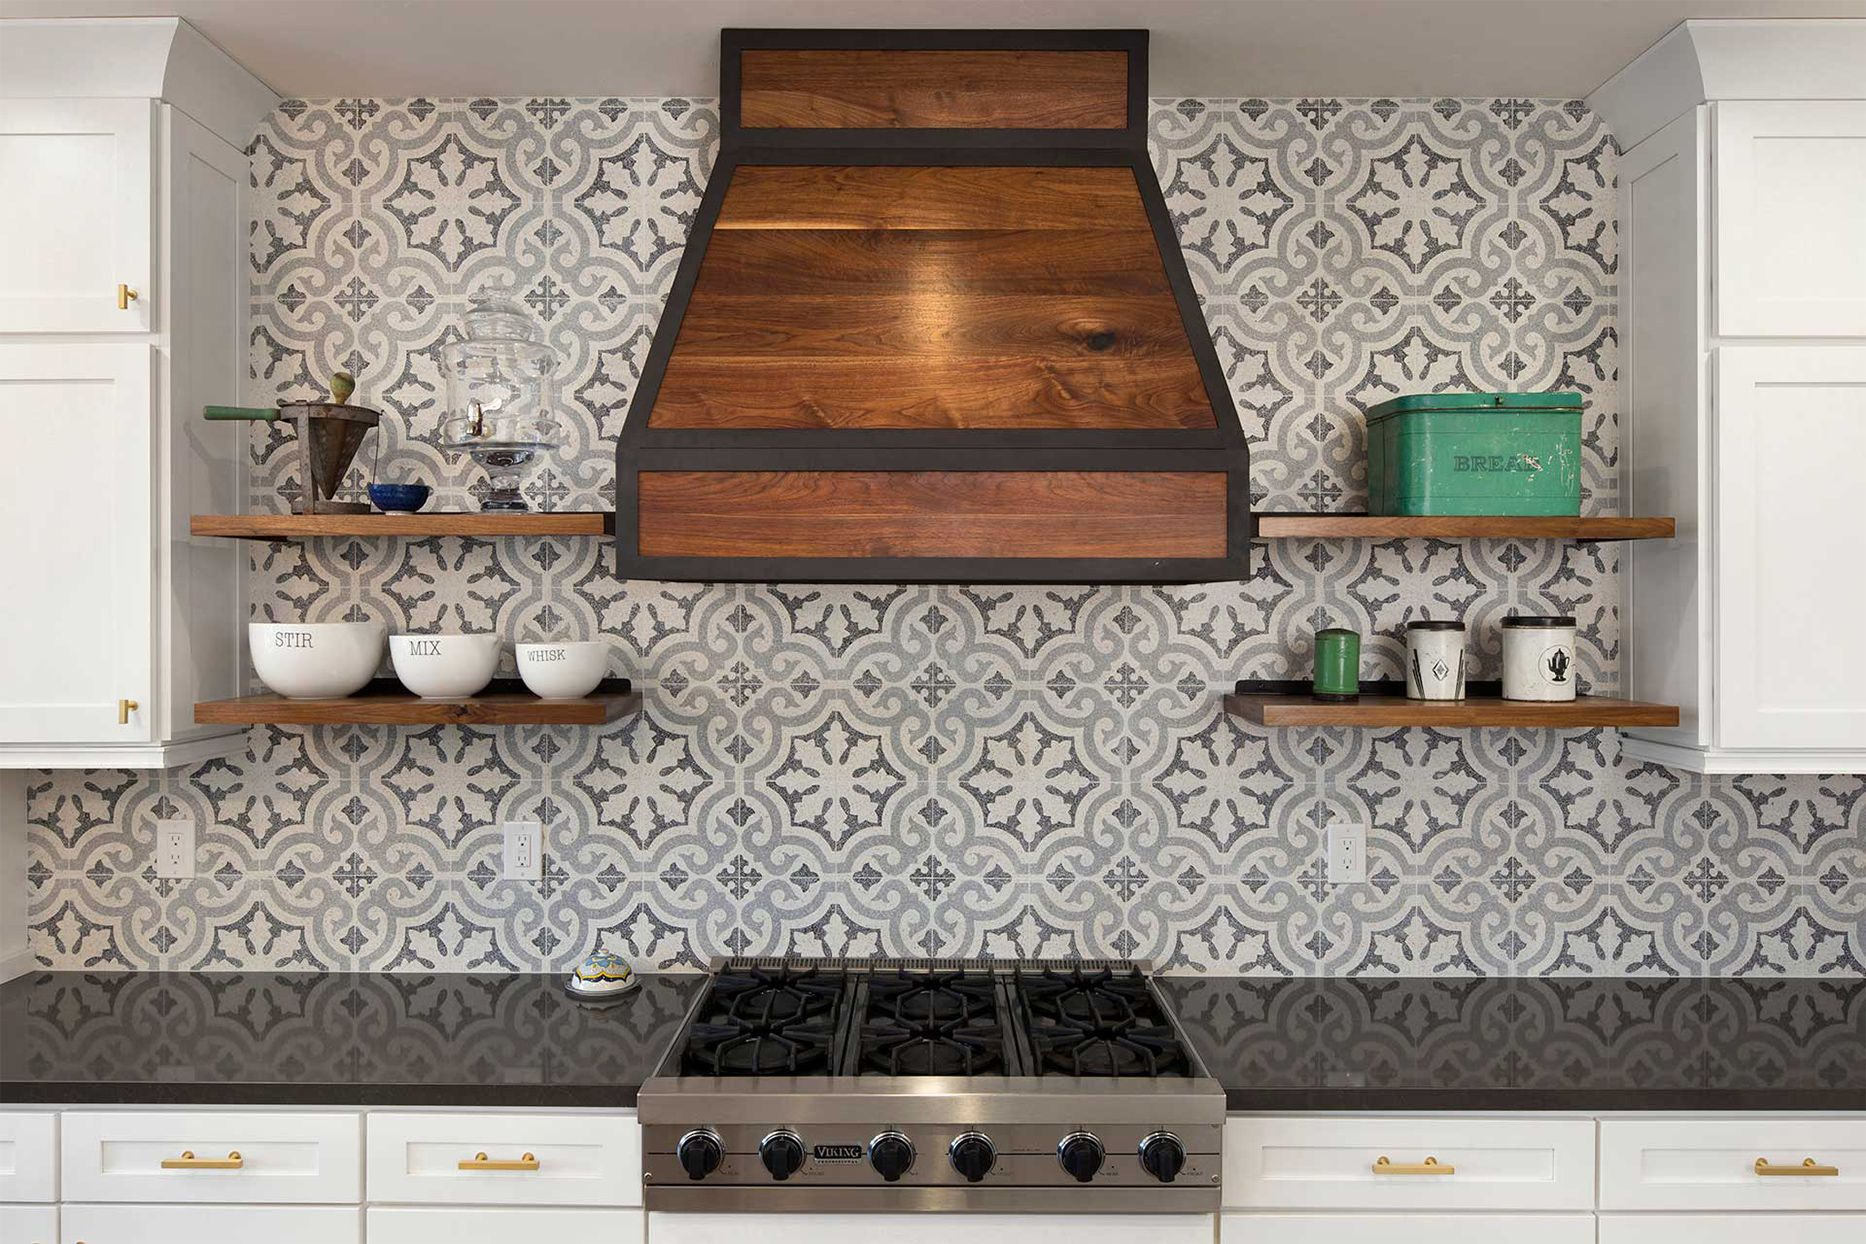 Spotlight On Kitchen Backsplash Trends Interior Designs Love Most Kitchen Backsplash Trends Rustic Kitchen Backsplash Backsplash Trends